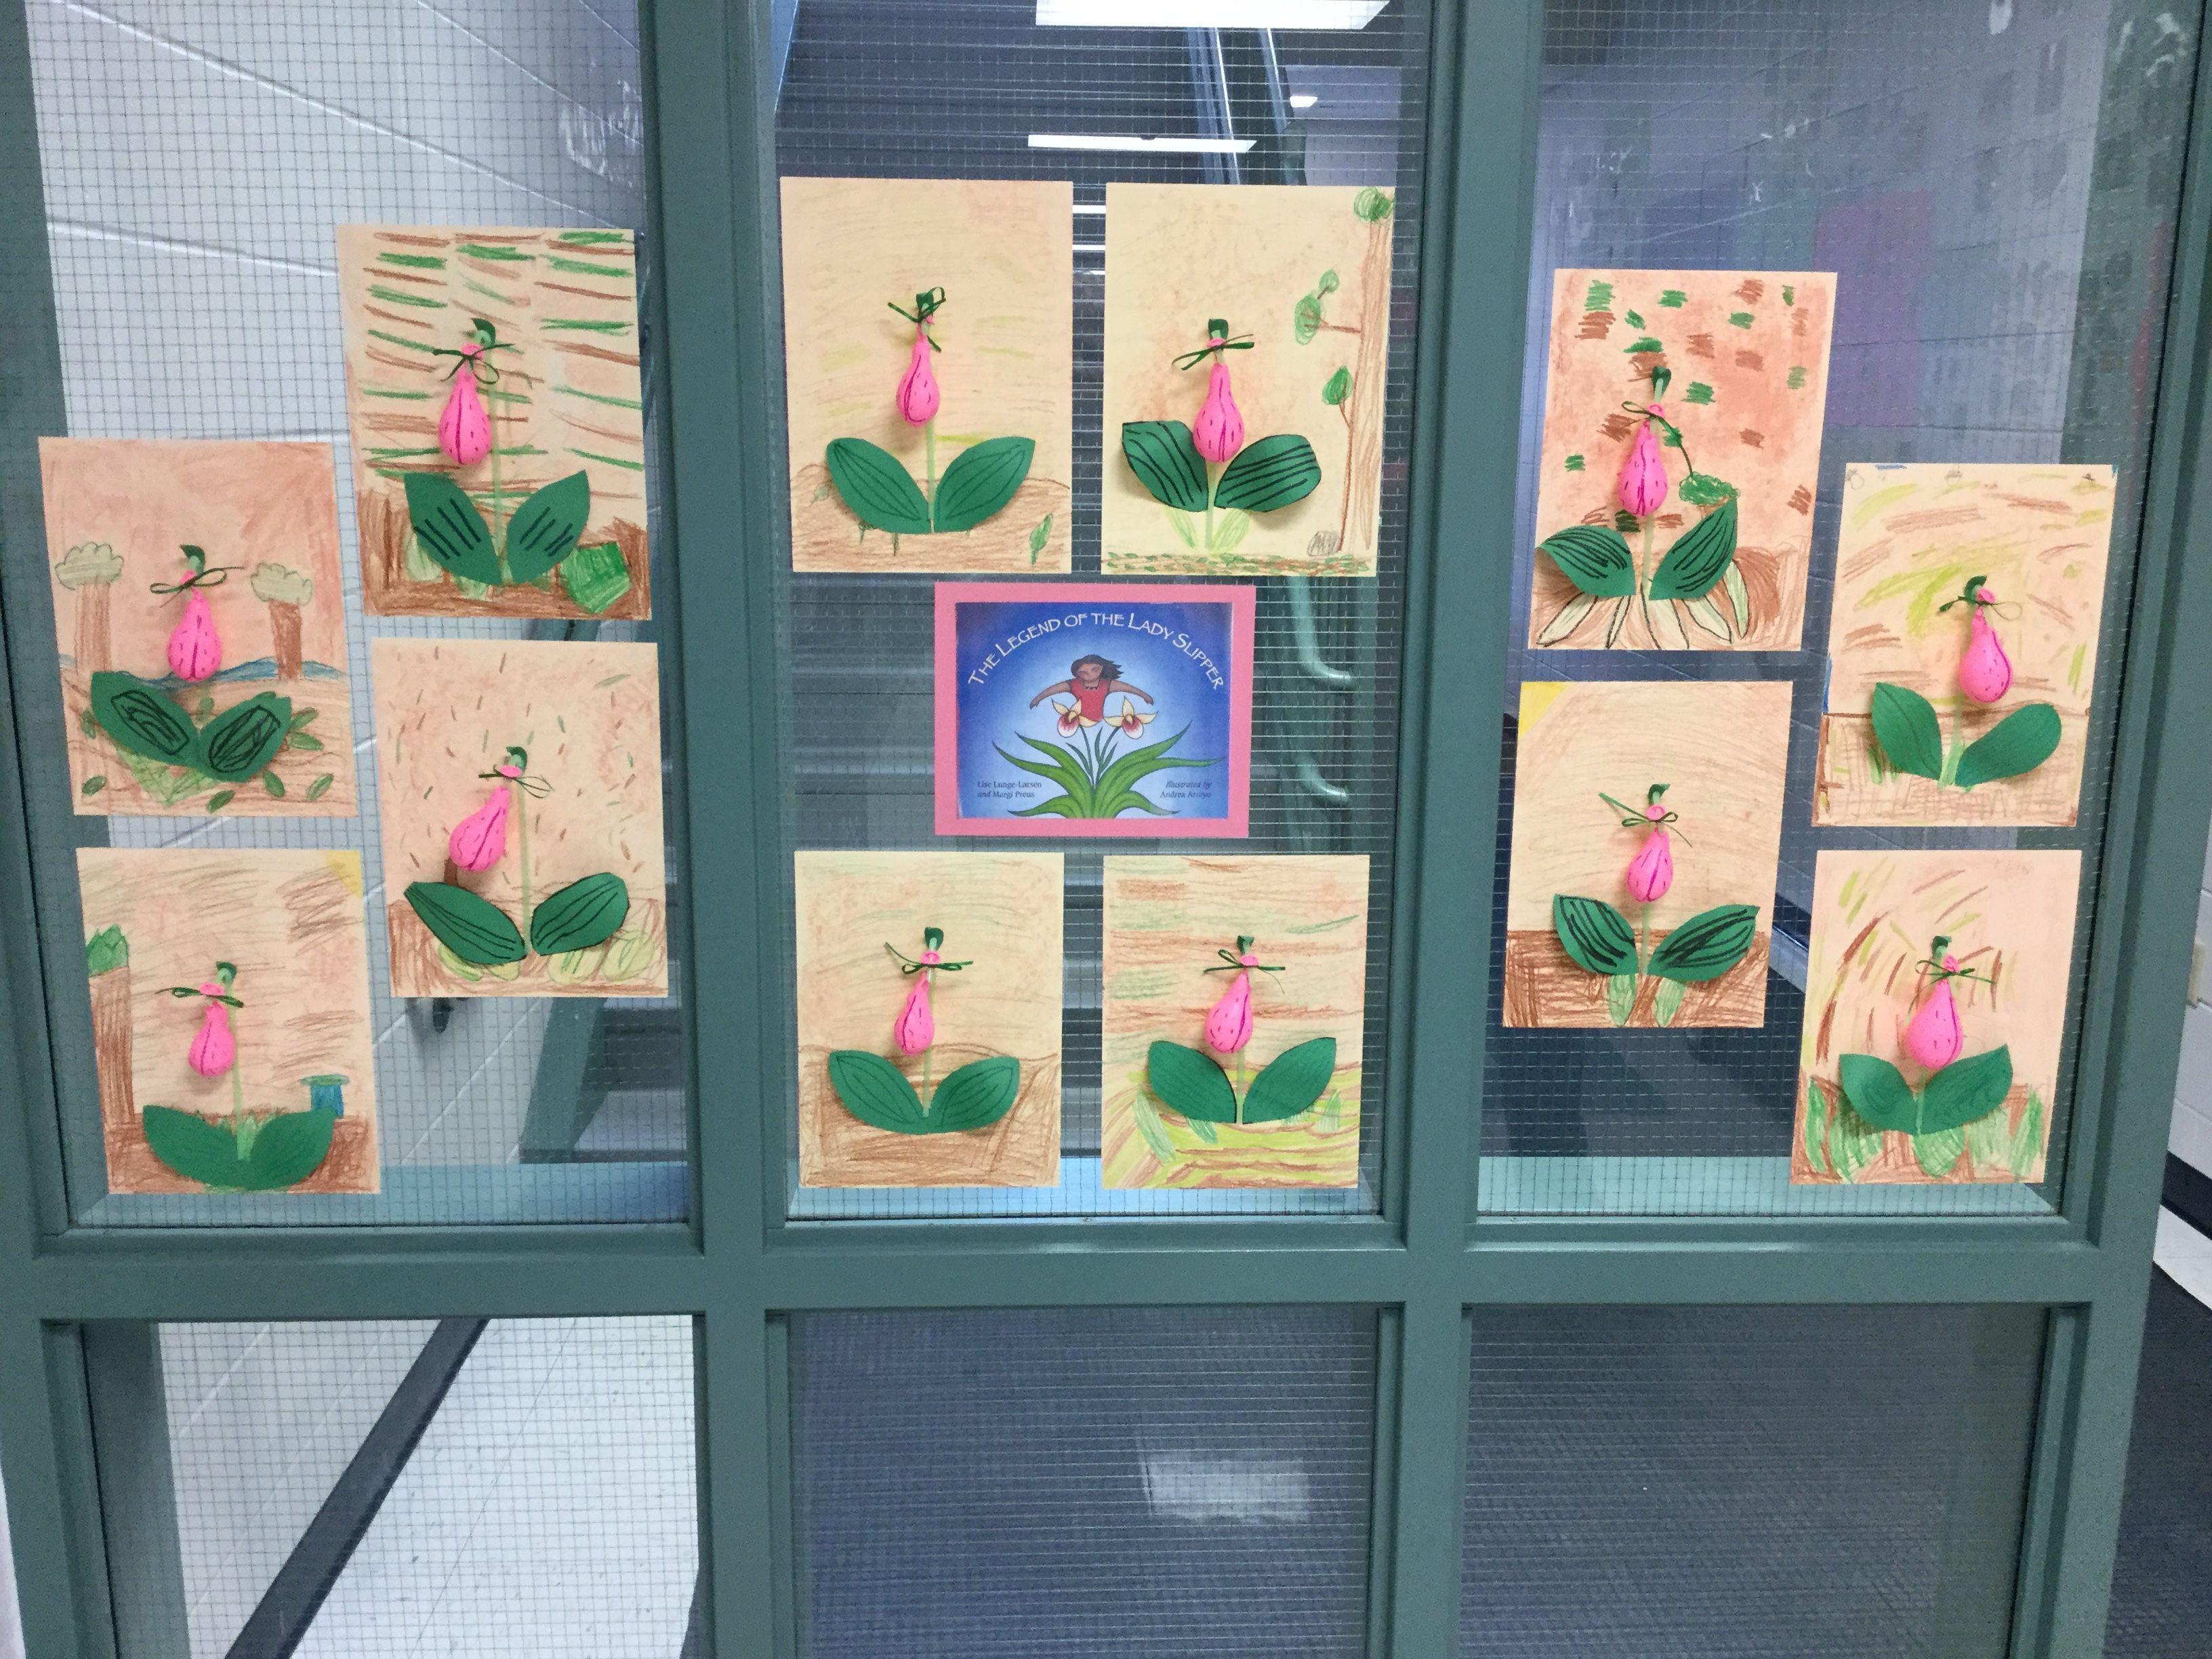 Lady Slipper Craft Legend Of The Lady Slipper Kindergarten Themes Preschool Crafts Lady Slipper Flower